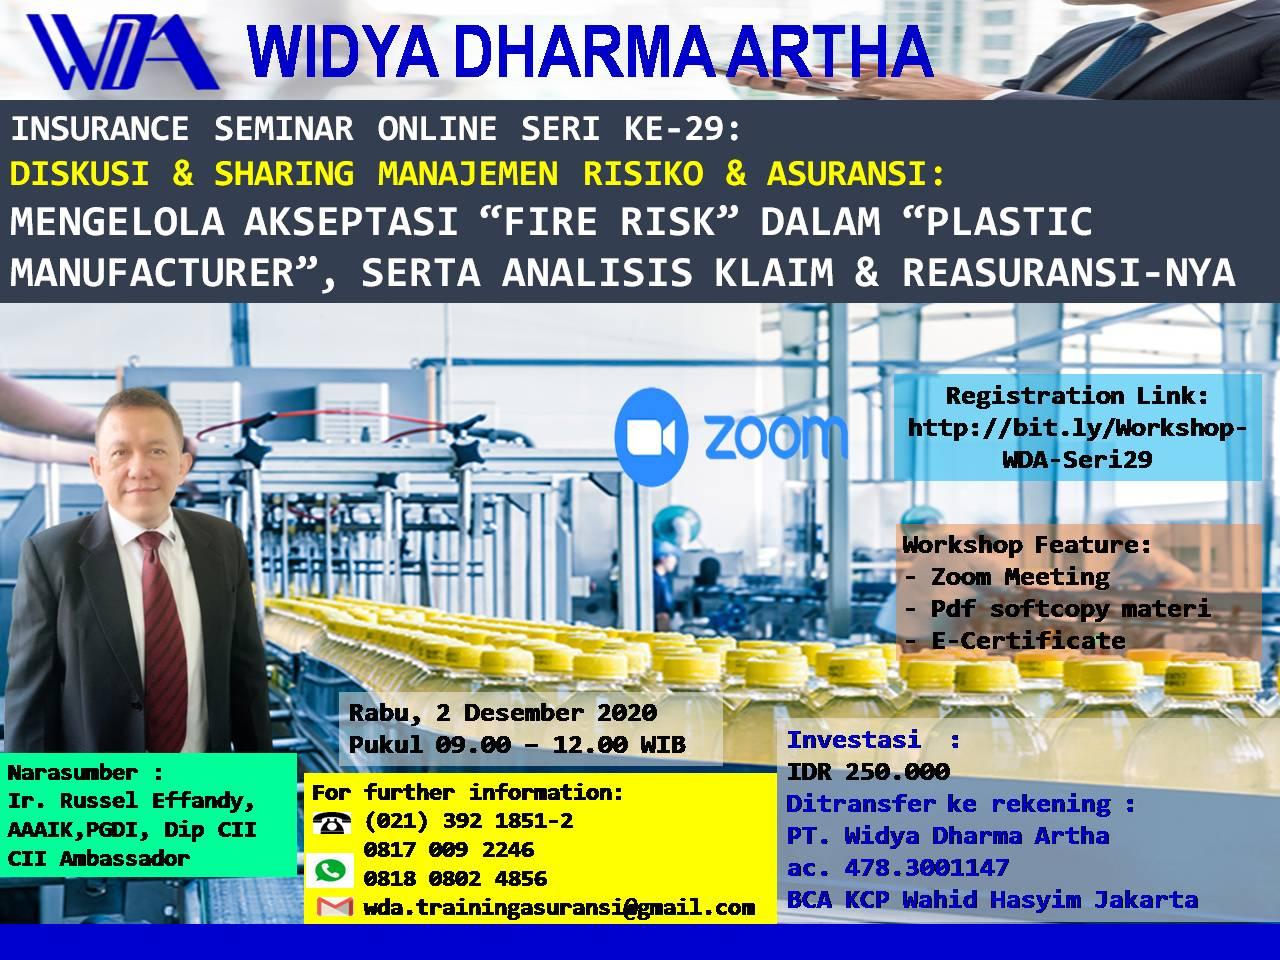 wda-pelatihan-online-plastic-manufacturers-risks-and-insurance-2-desember-2020